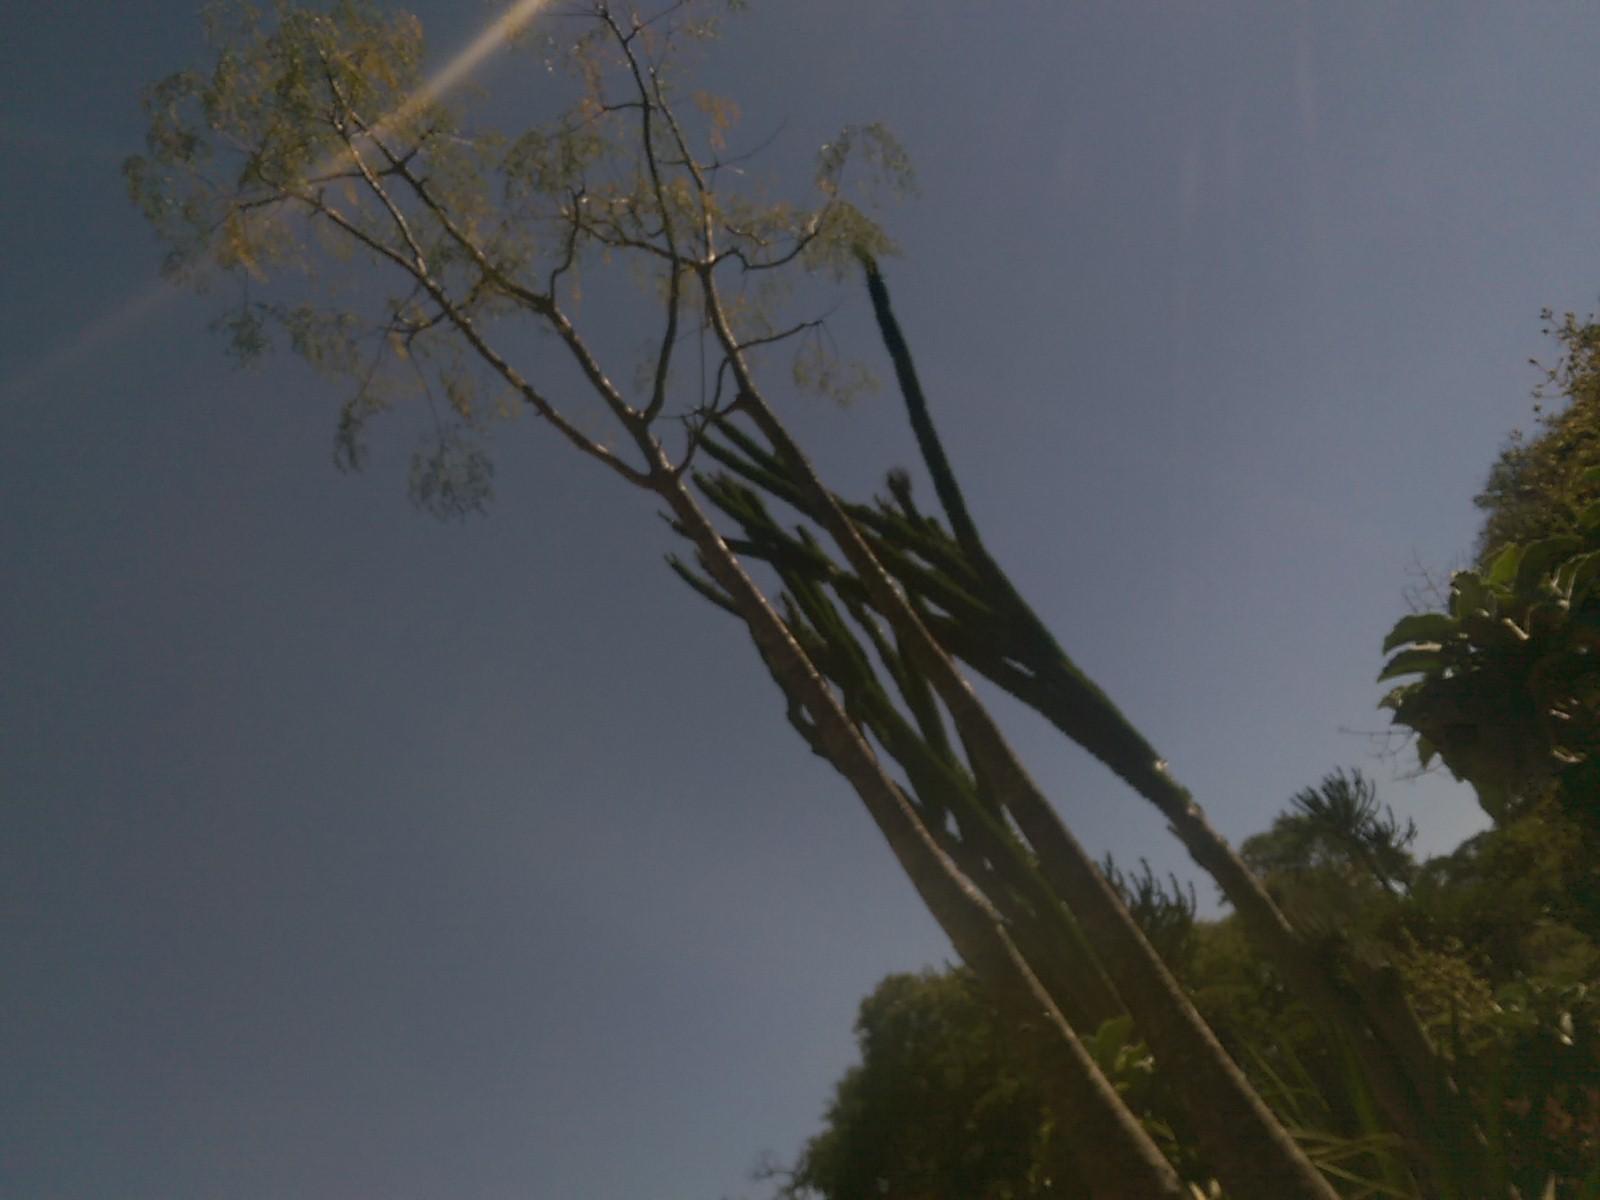 Tall narrow cactii and trees against a blue sky